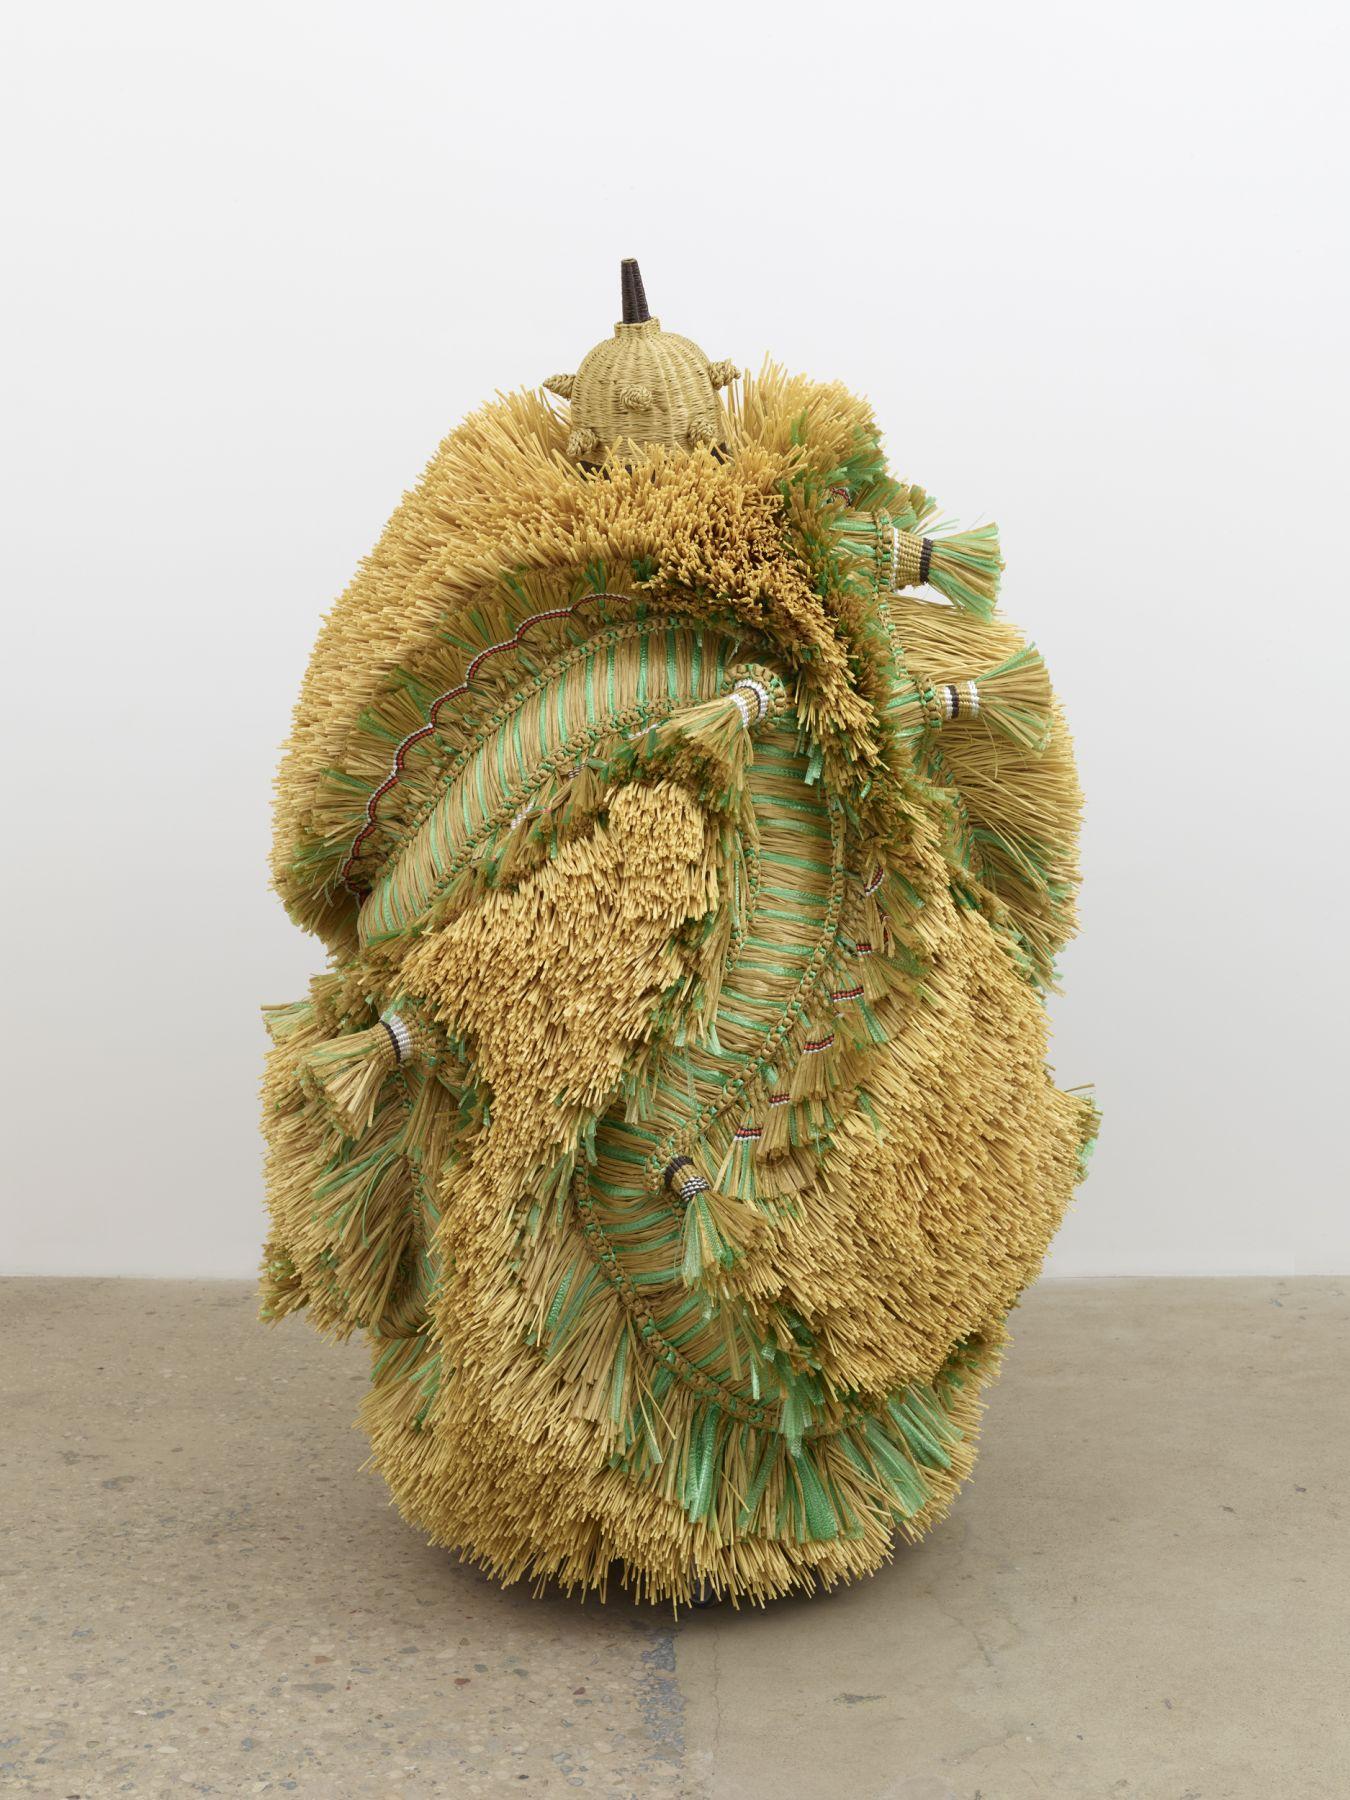 Haegue Yang, The Intermediate – Dragon Conglomerate, 2015